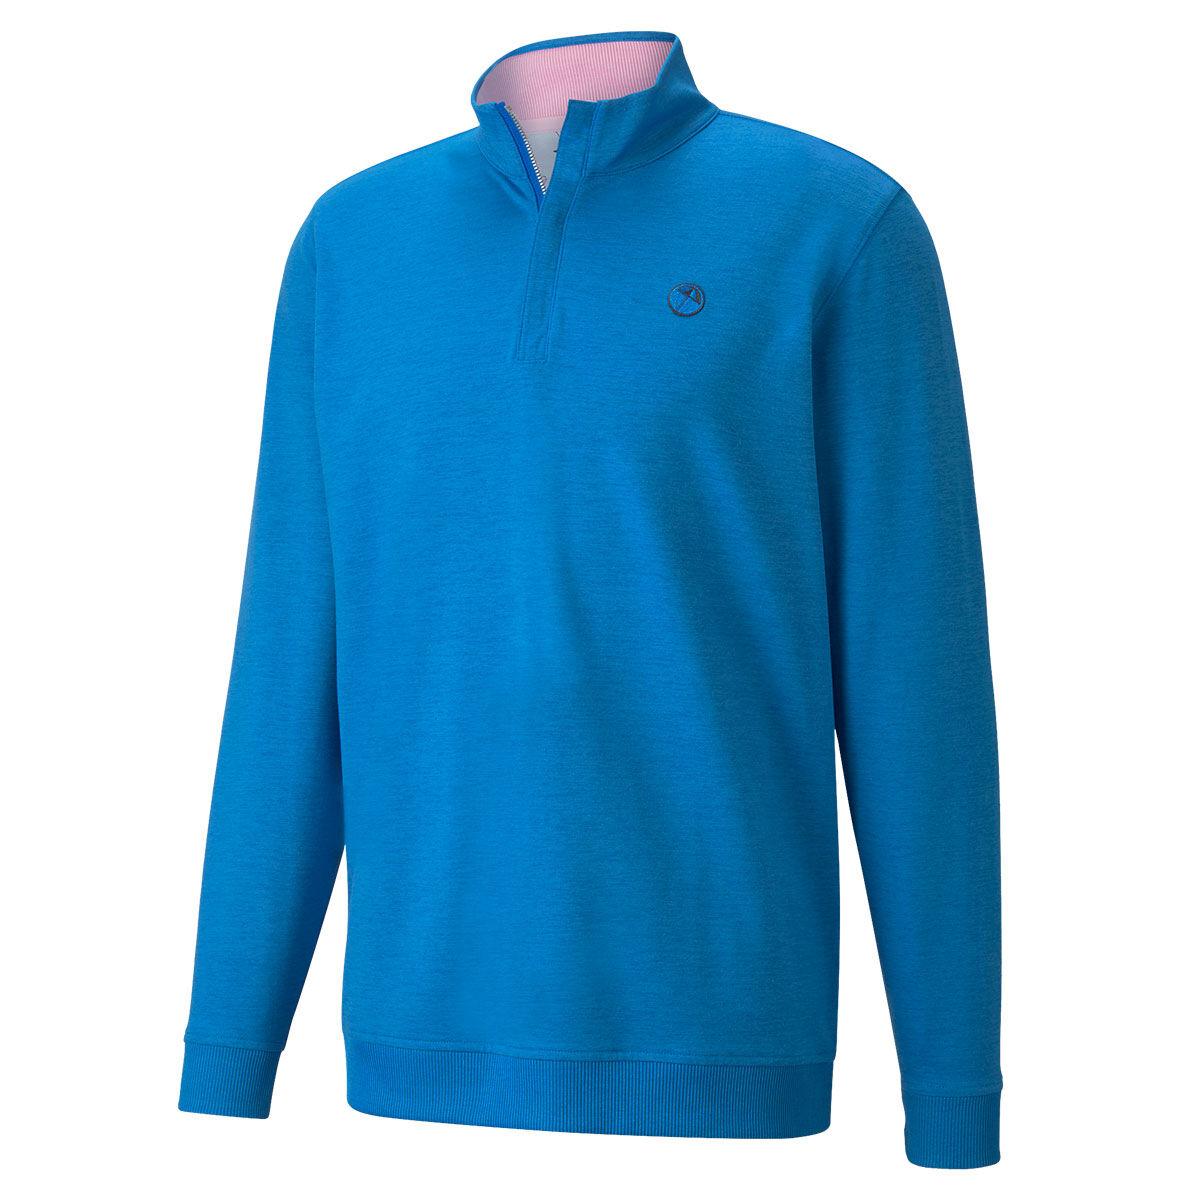 PUMA Golf AP Clubhouse ¼ Zip Midlayer, Mens, Future blue heather, Large | American Golf